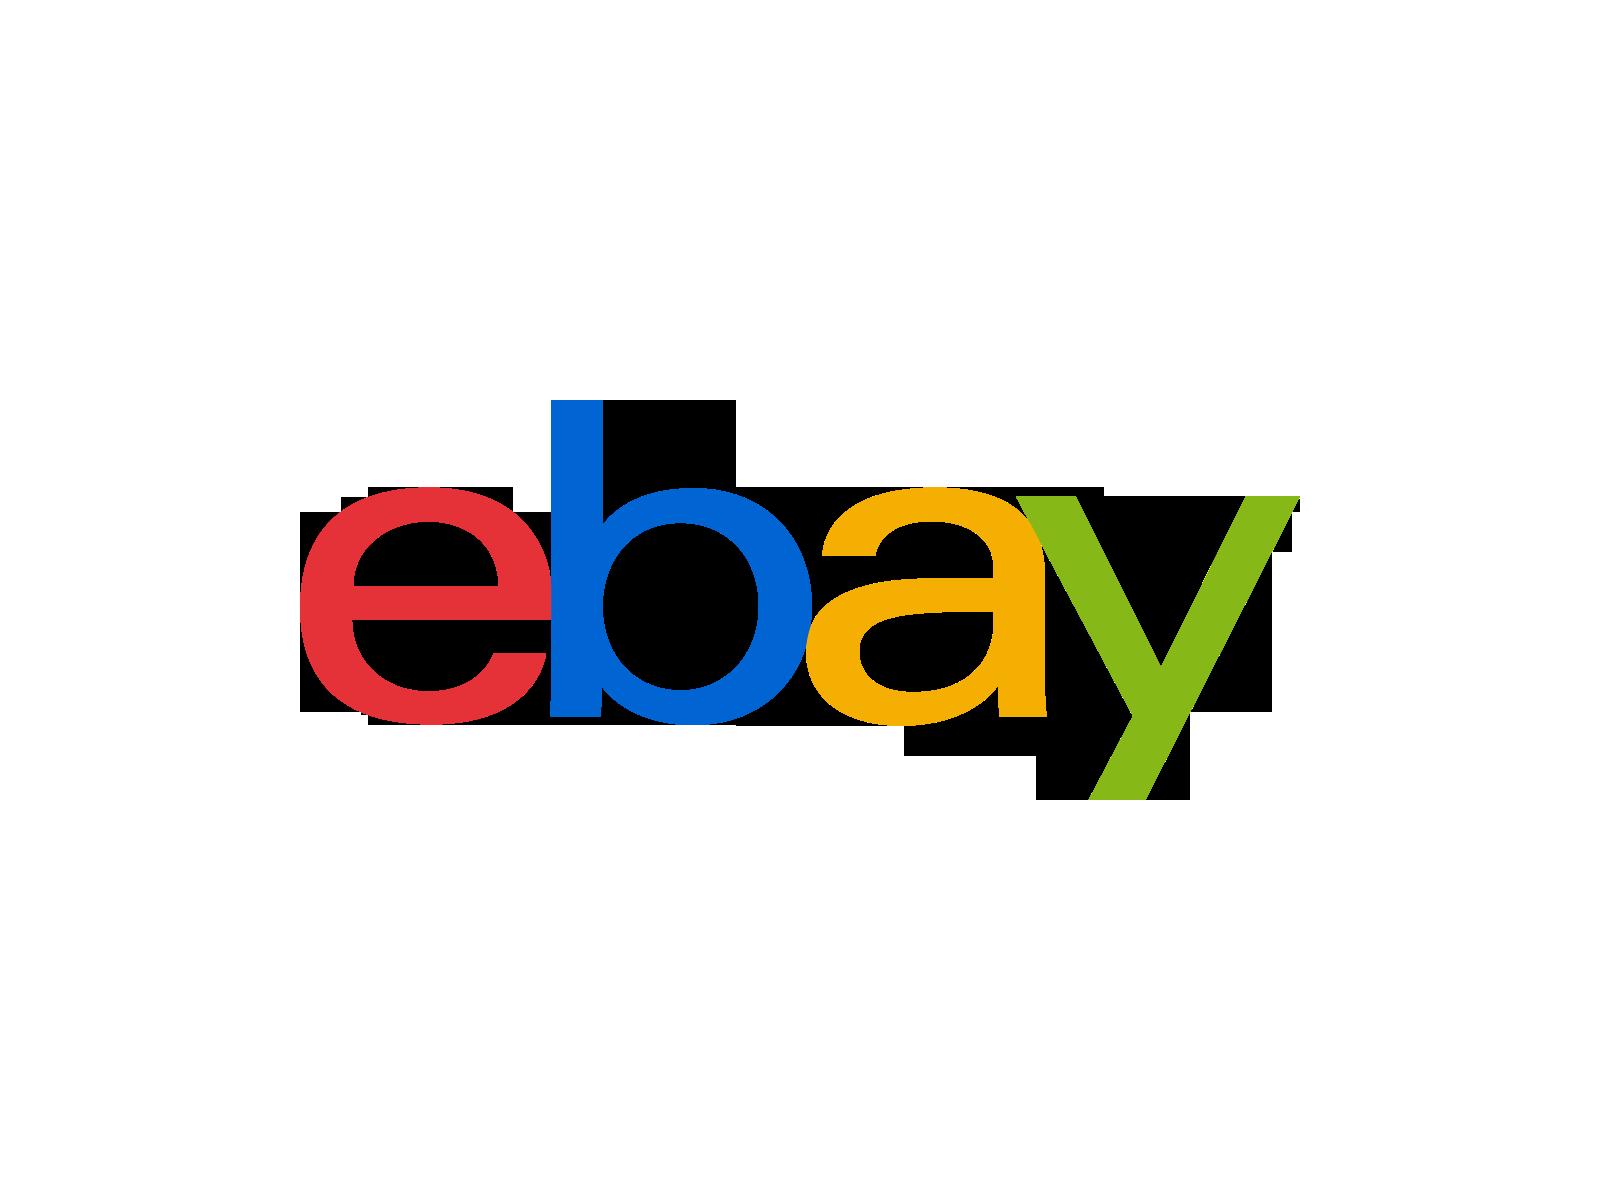 Brent's Lawnmower on Ebay